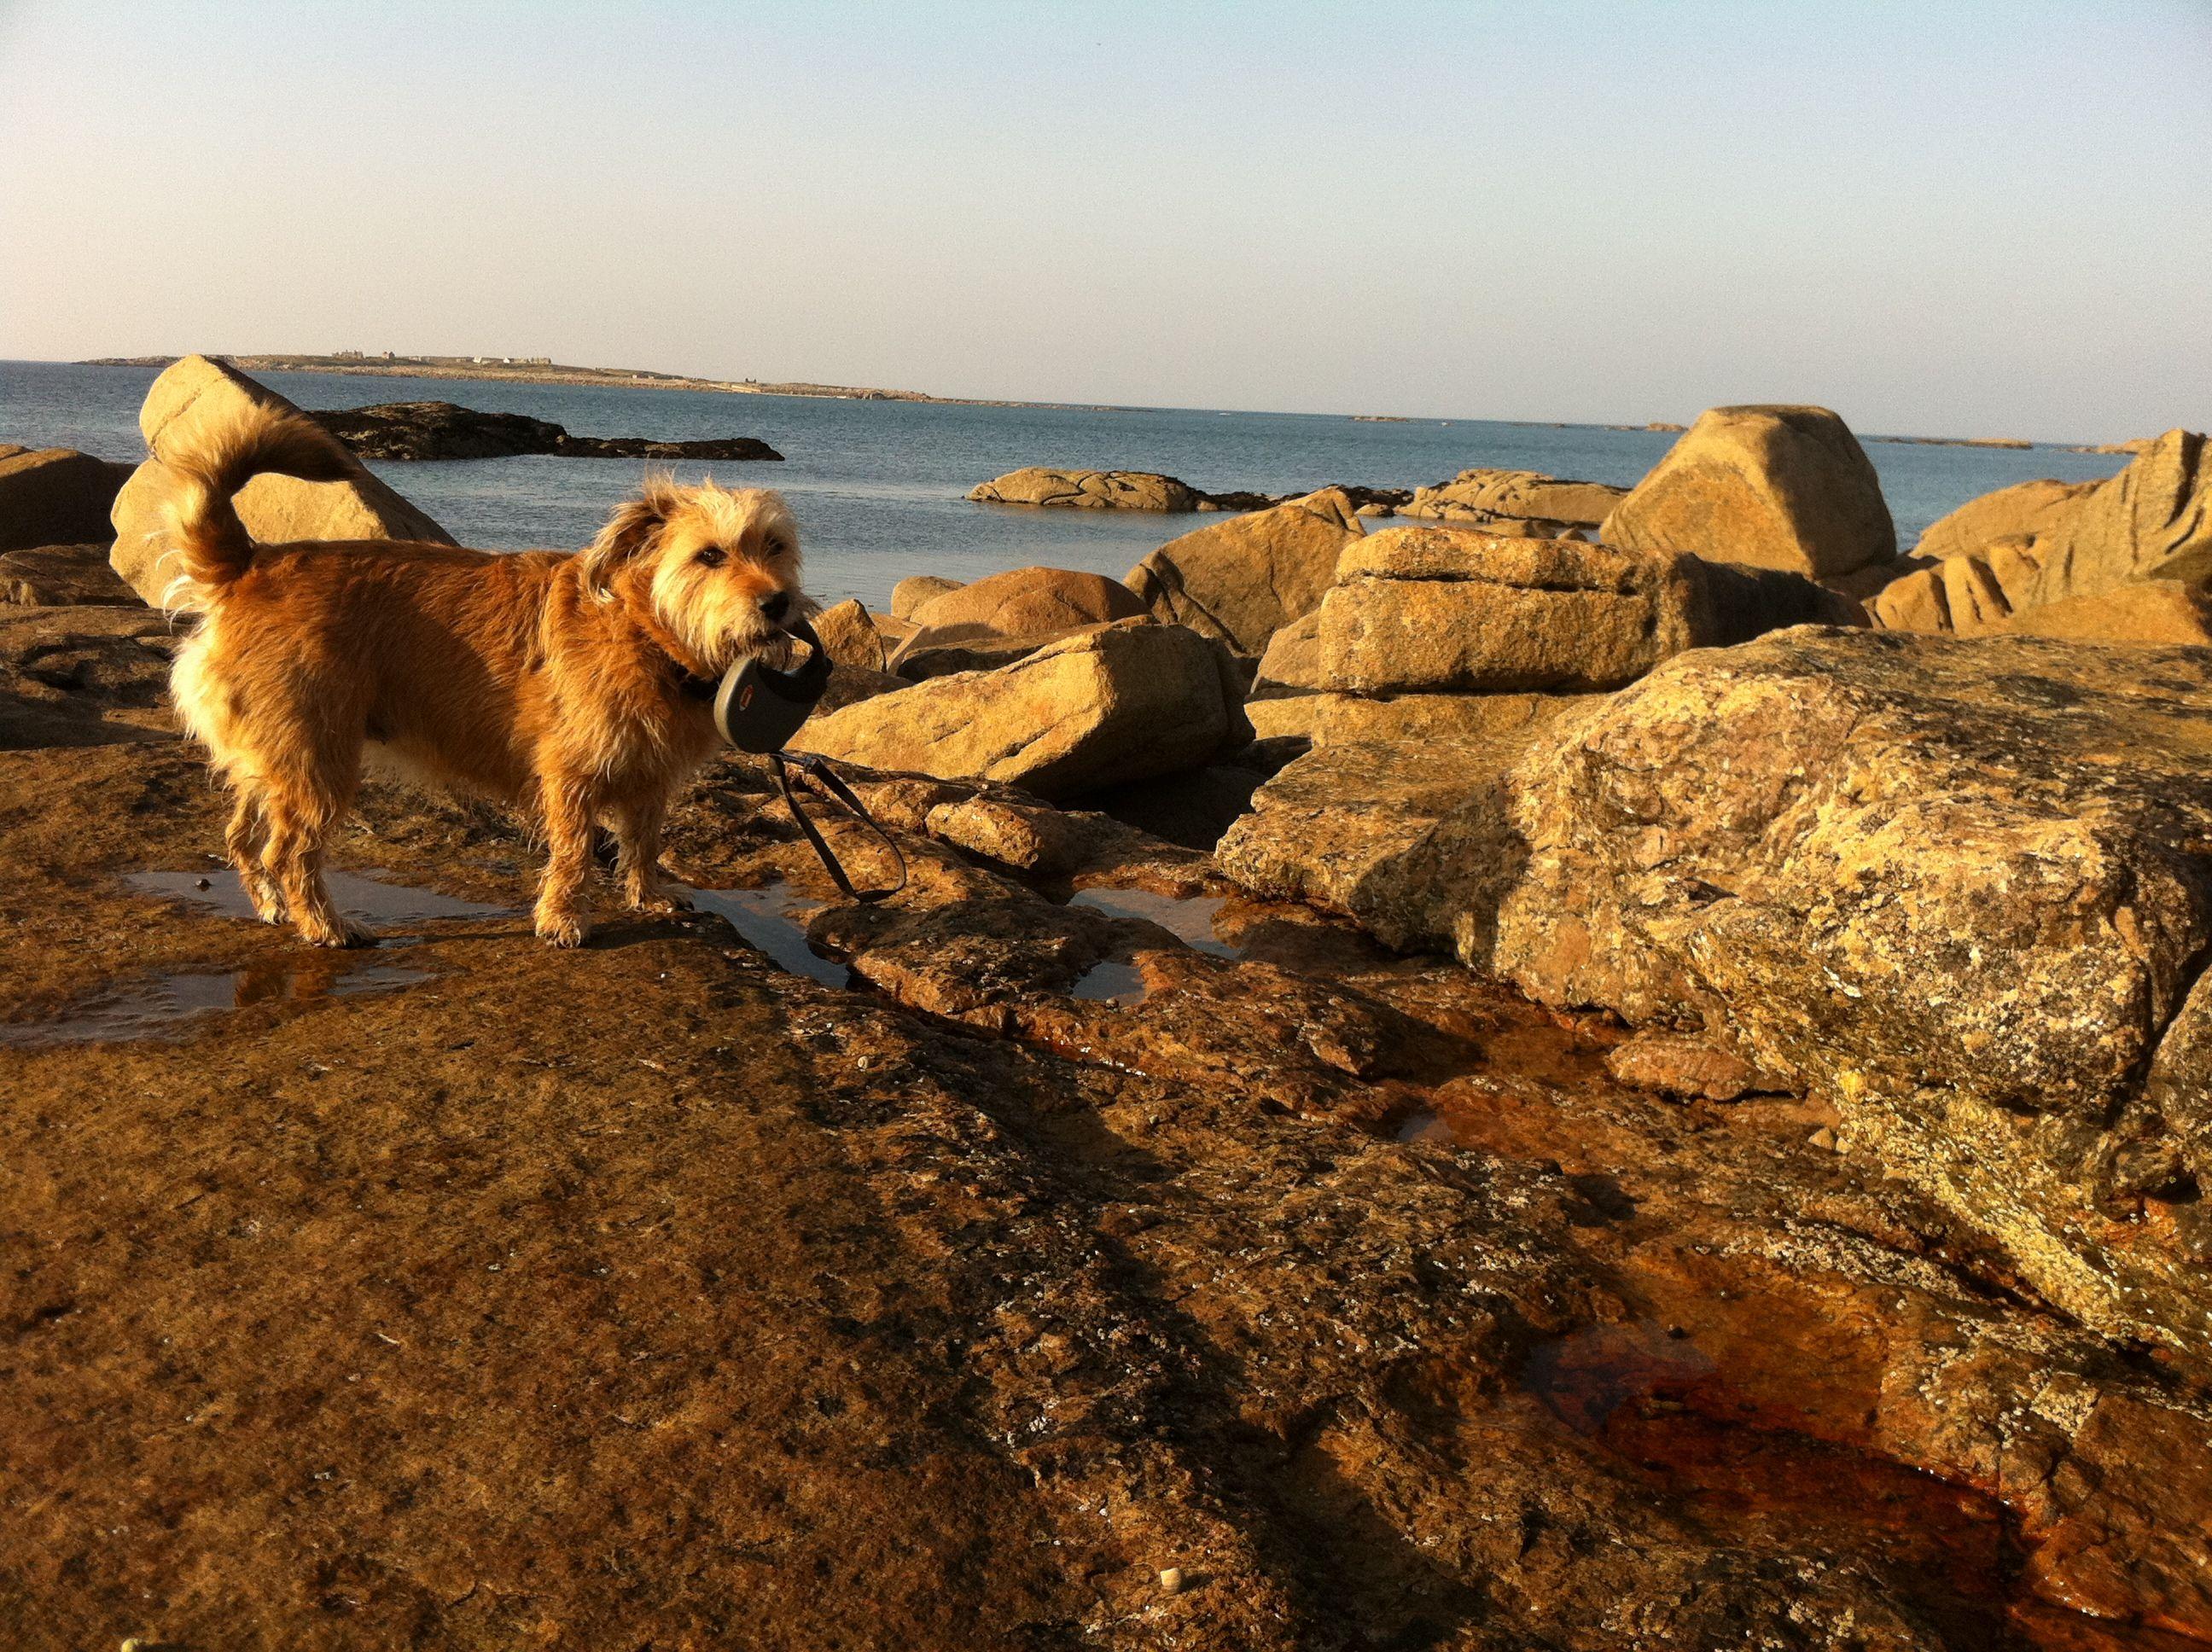 Glassagh beach, Gweedore